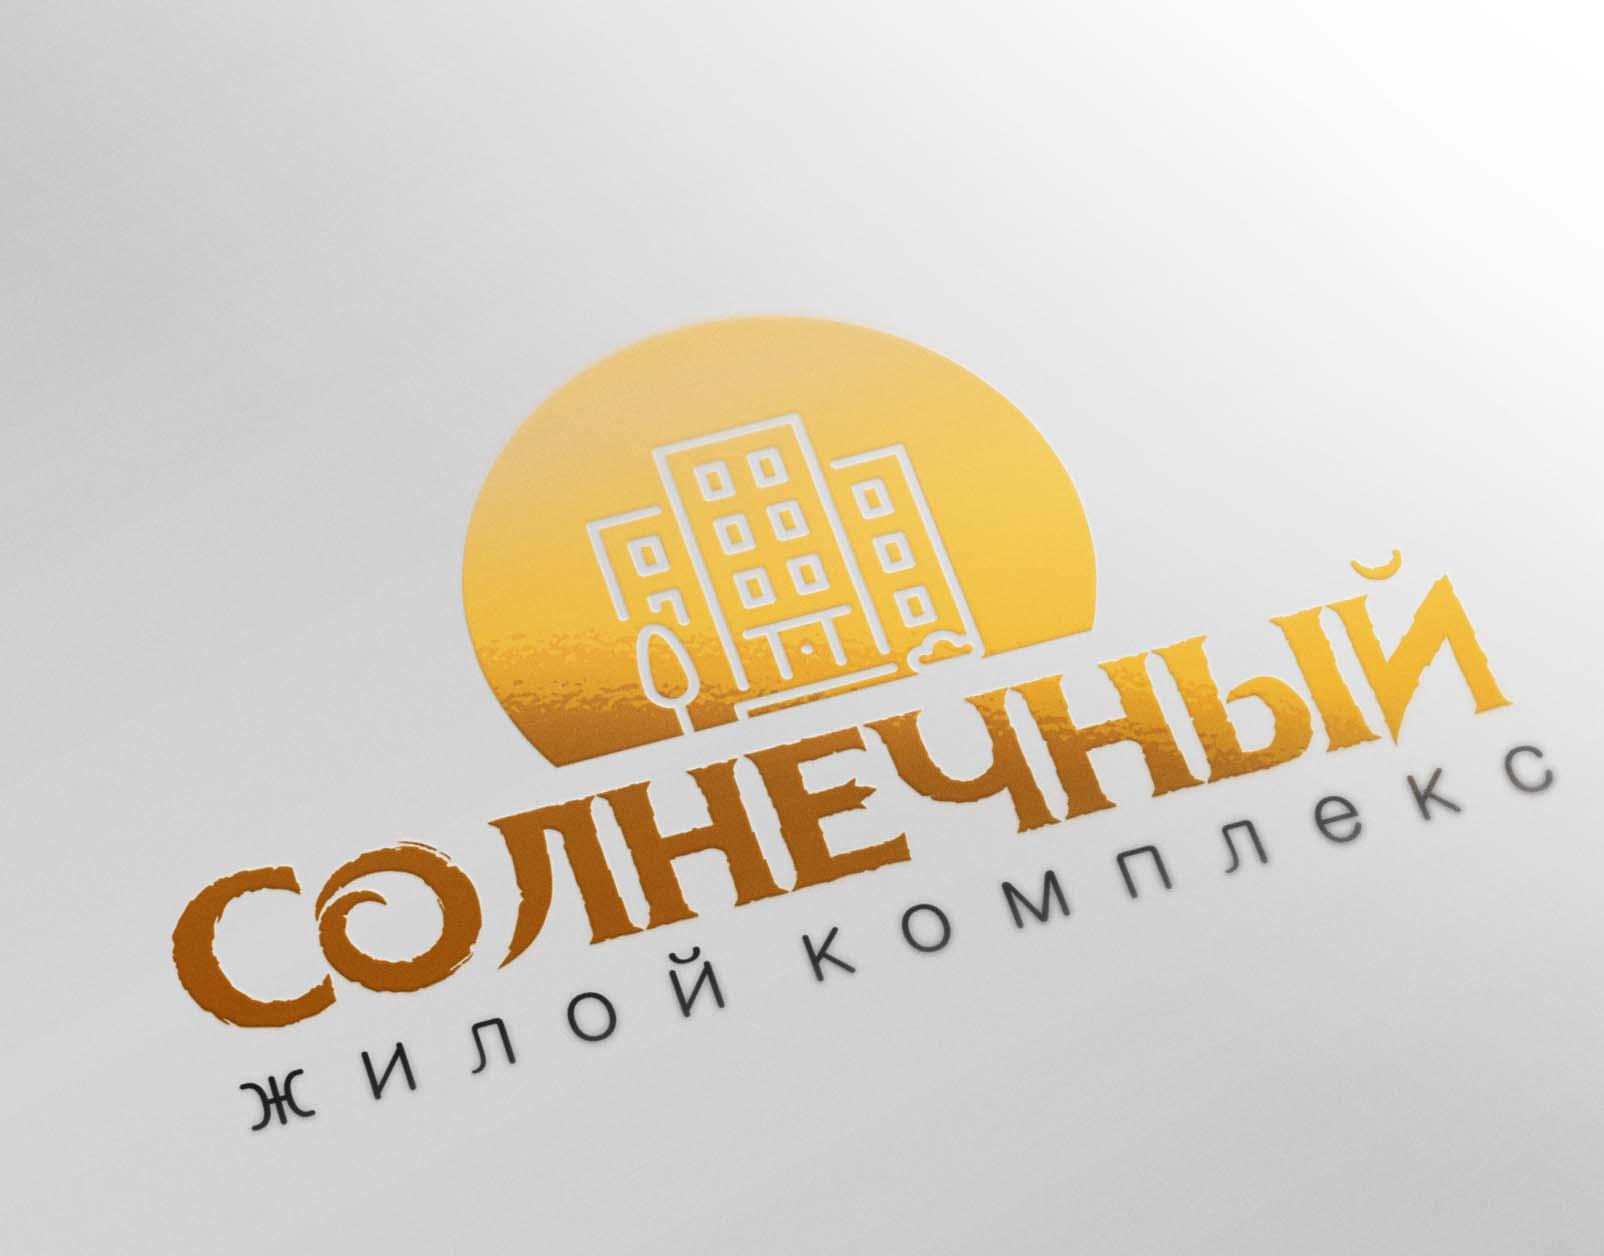 Разработка логотипа и фирменный стиль фото f_6605970da8d520c9.jpg